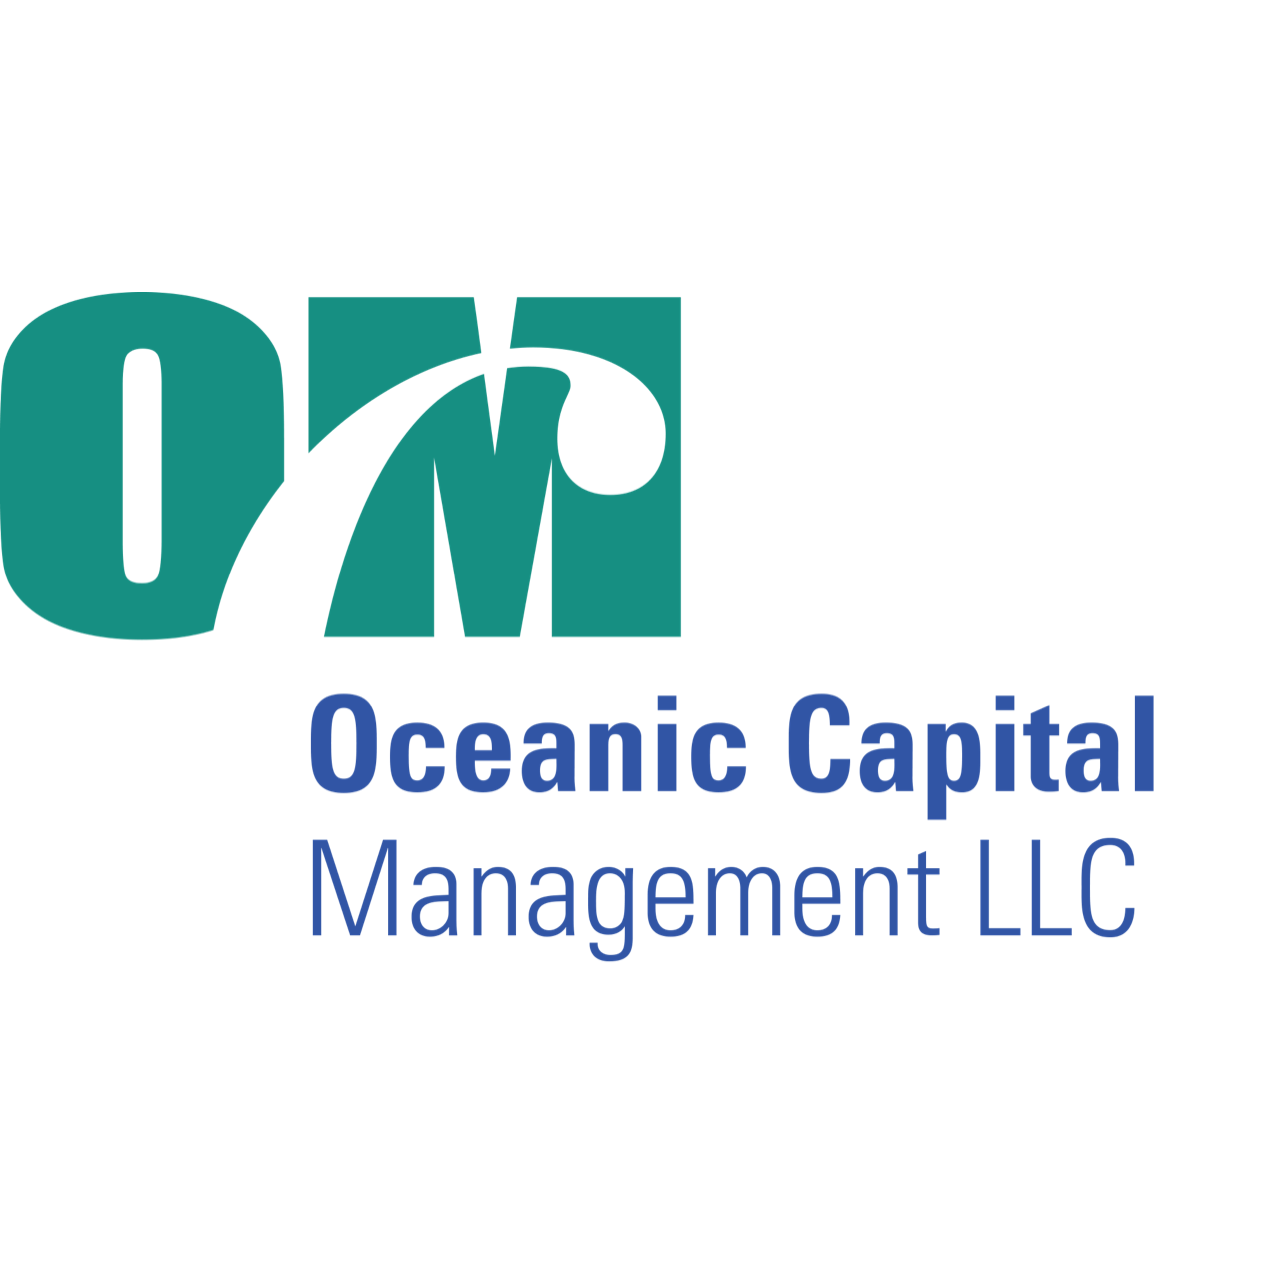 Oceanic Capital Management